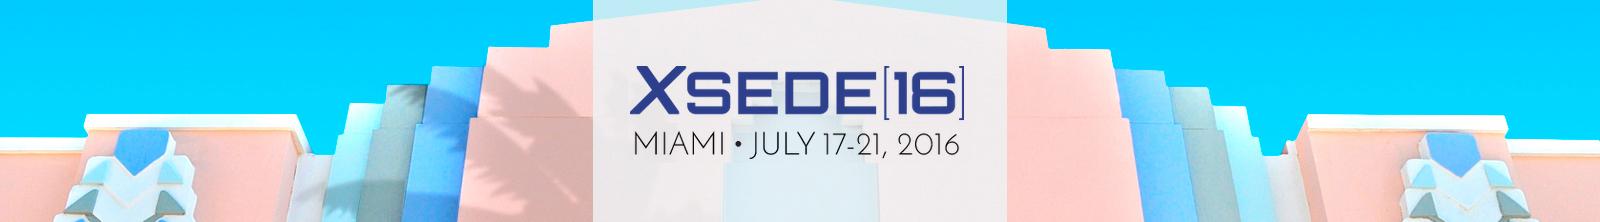 XSEDE16-Miami-logo-top